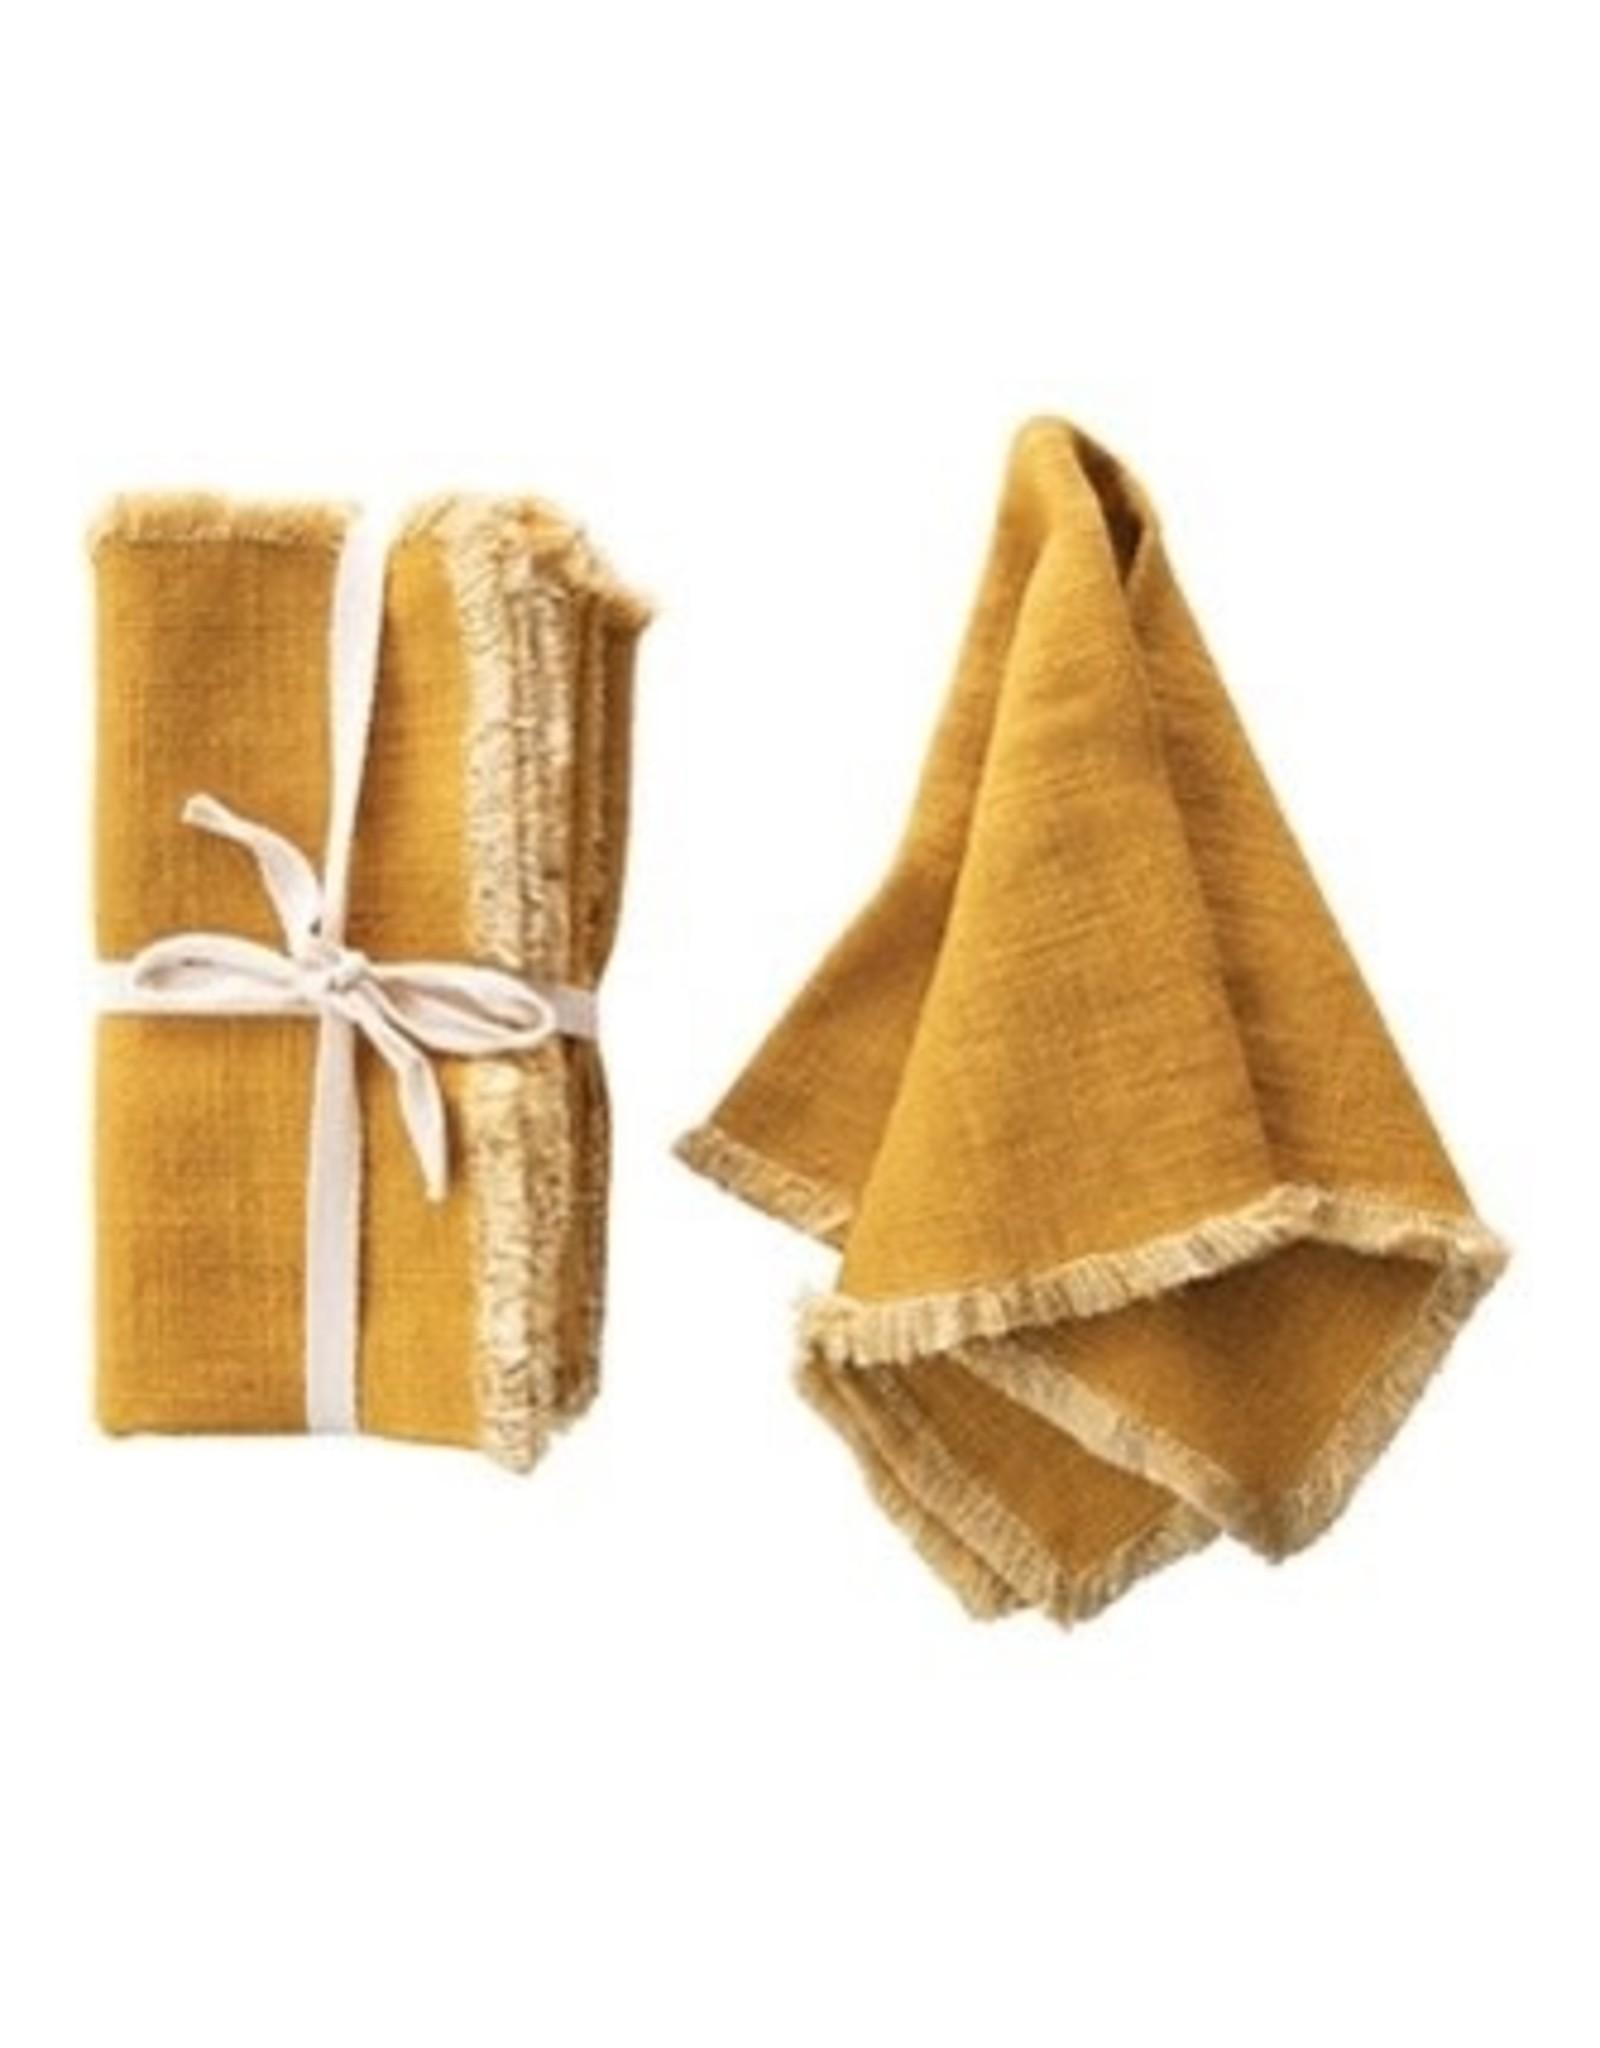 The Florist & The Merchant Linen Napkin - Mustard Set of 4